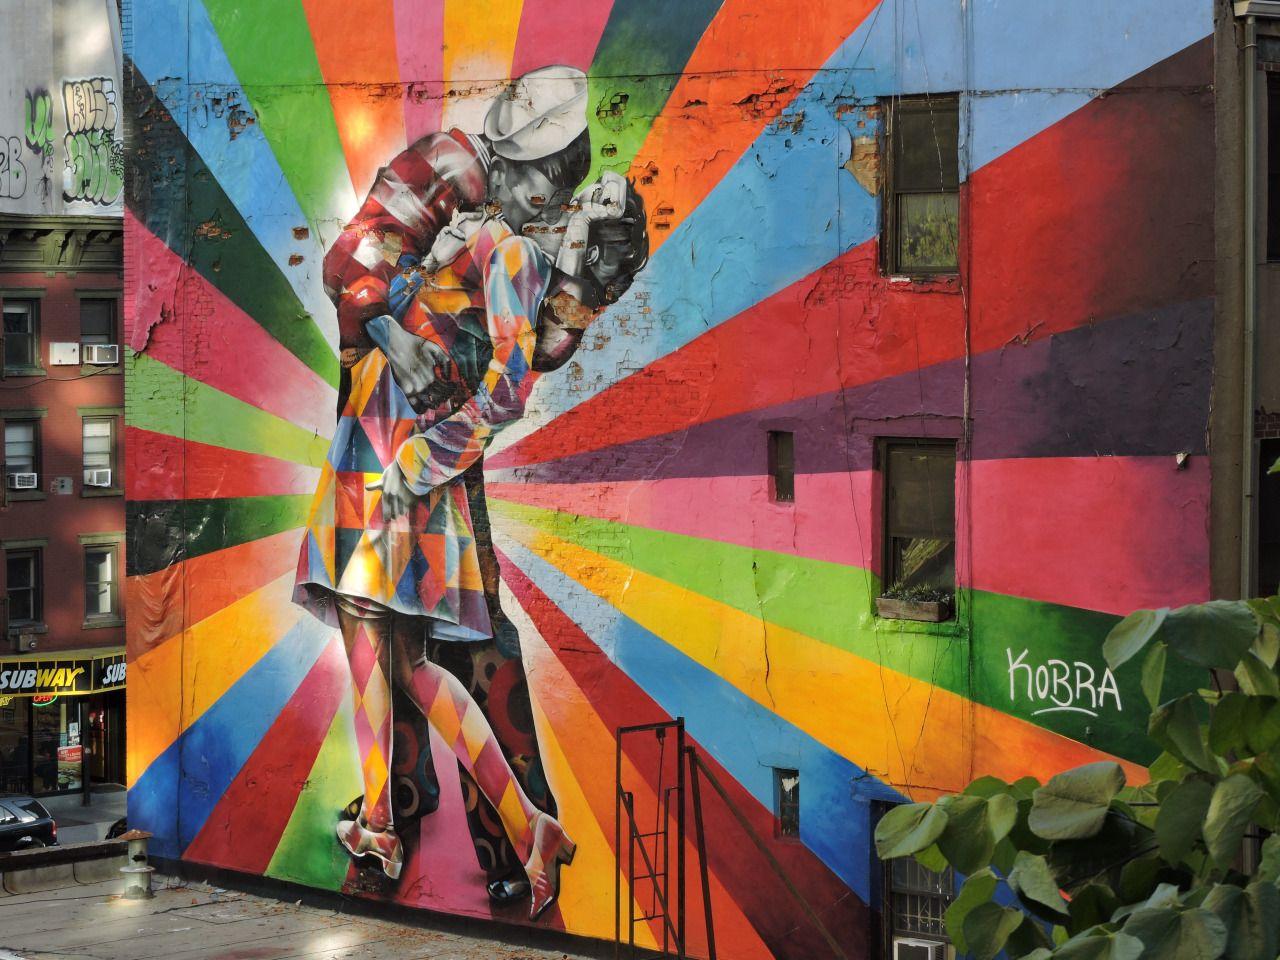 Highline Park Graffiti #love #lovelyplace #nyc #highline #bestkiss